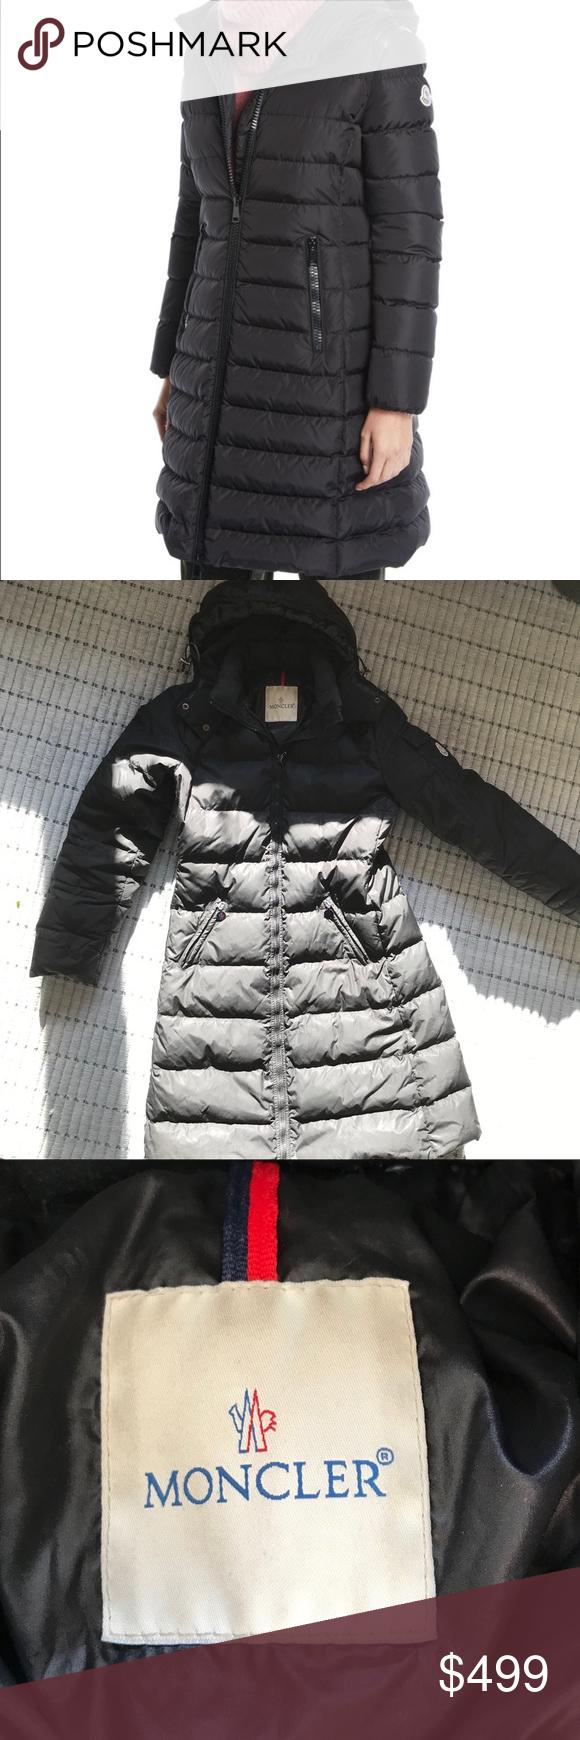 Moncler Puffer Long Down Coat/Jacket Size 1/ US24 Long